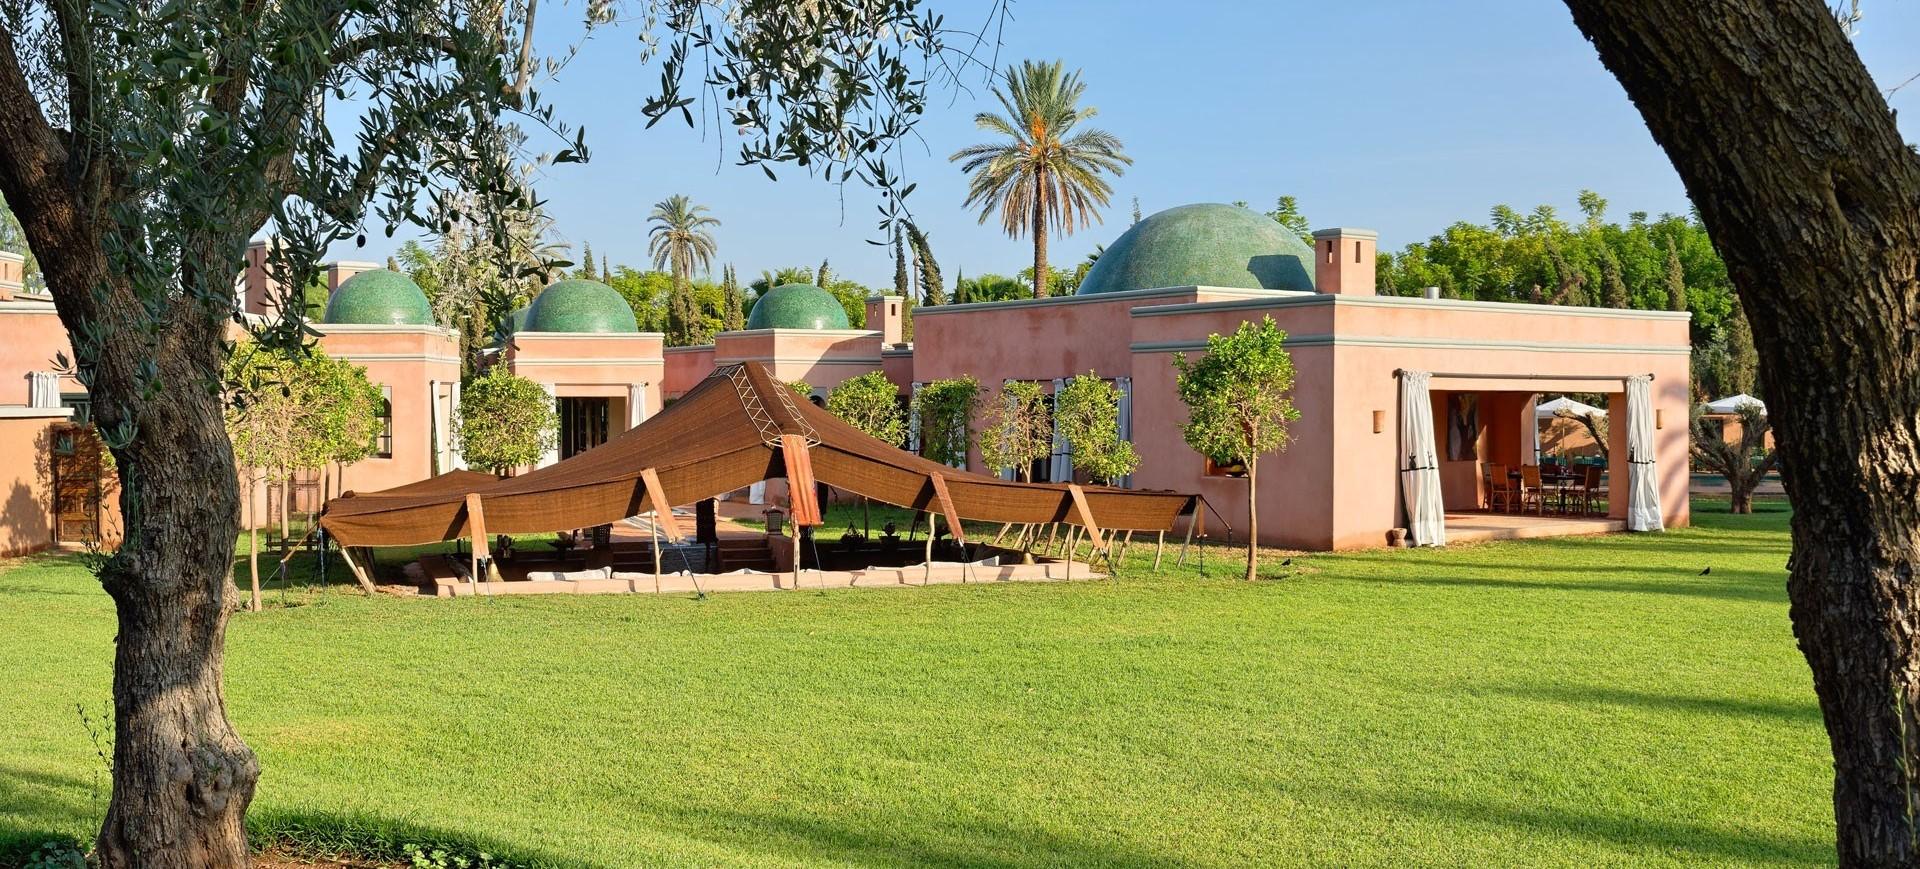 villa-azzaytouna-garden-berber-tent